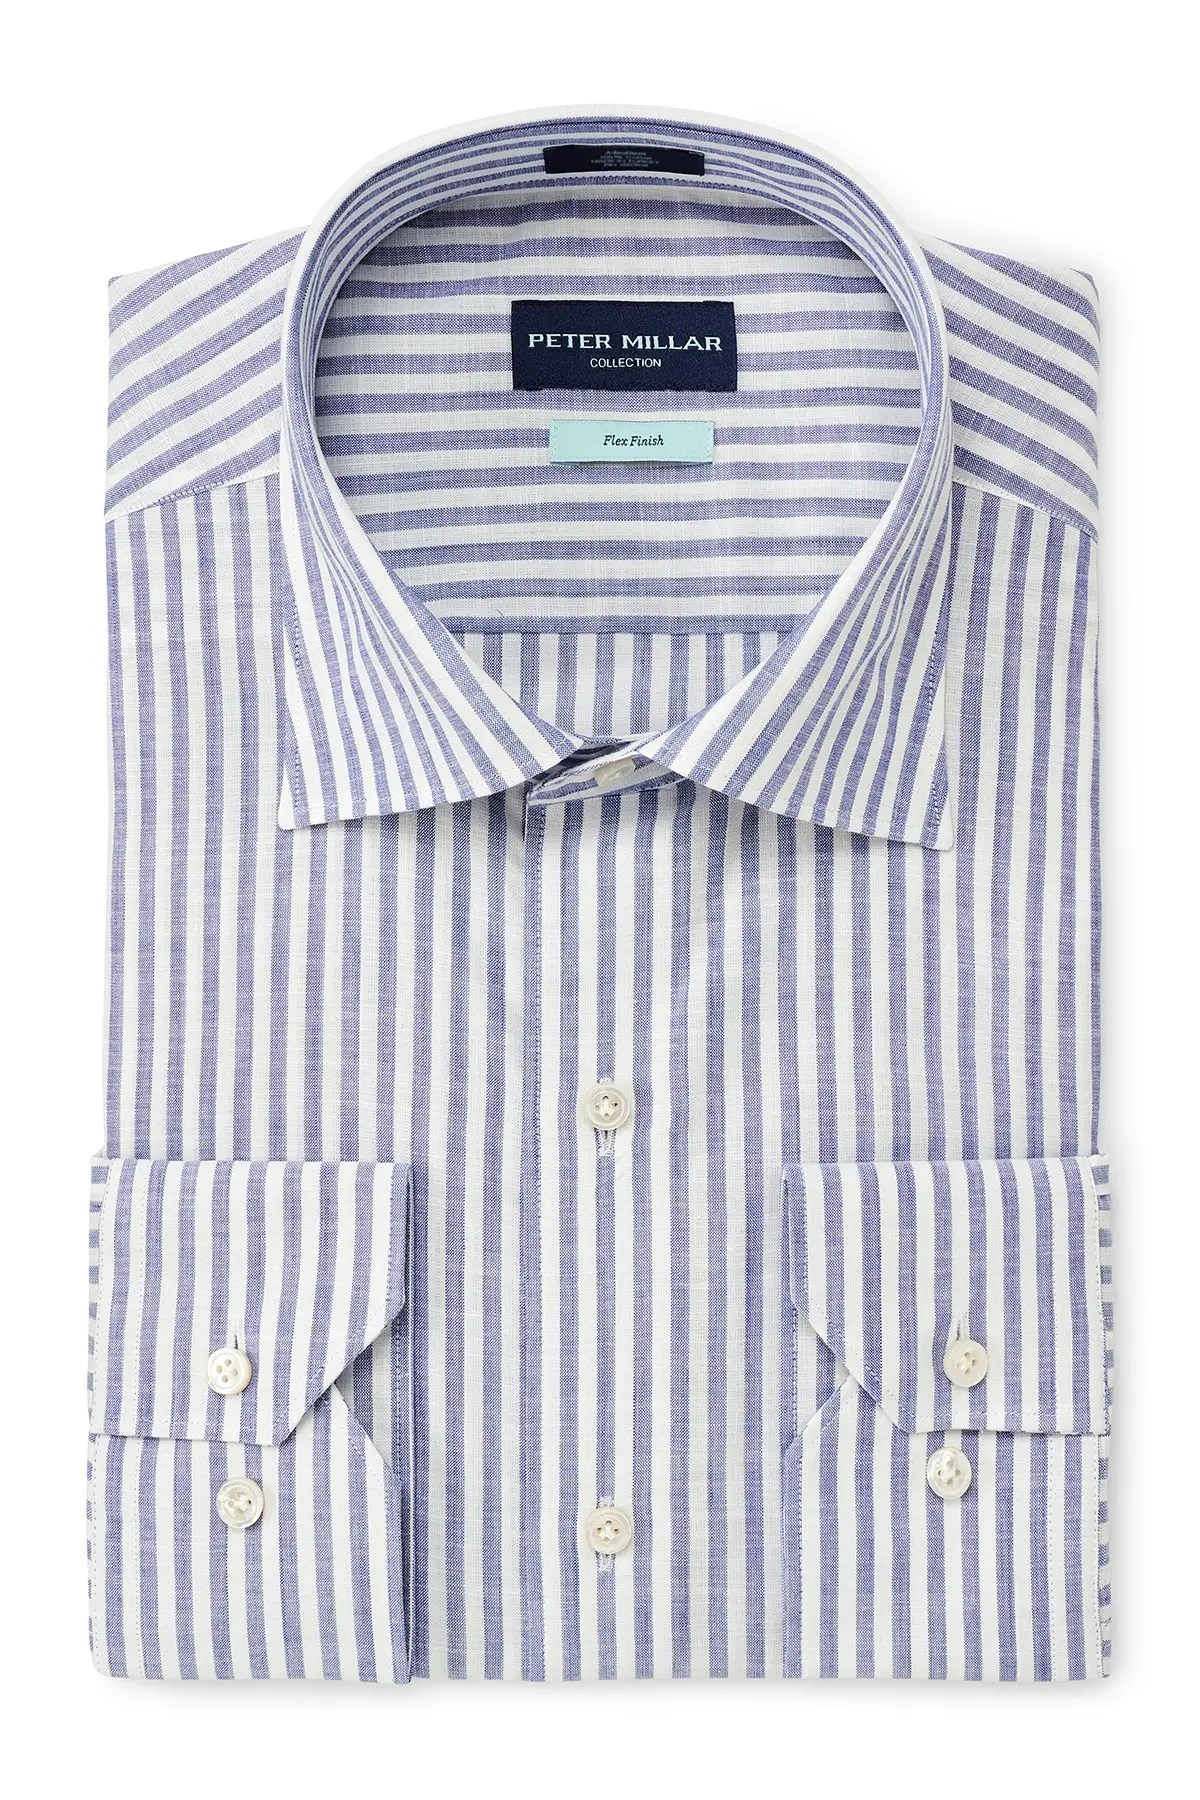 peter millar summer chambray stripe shirt nordstrom rack